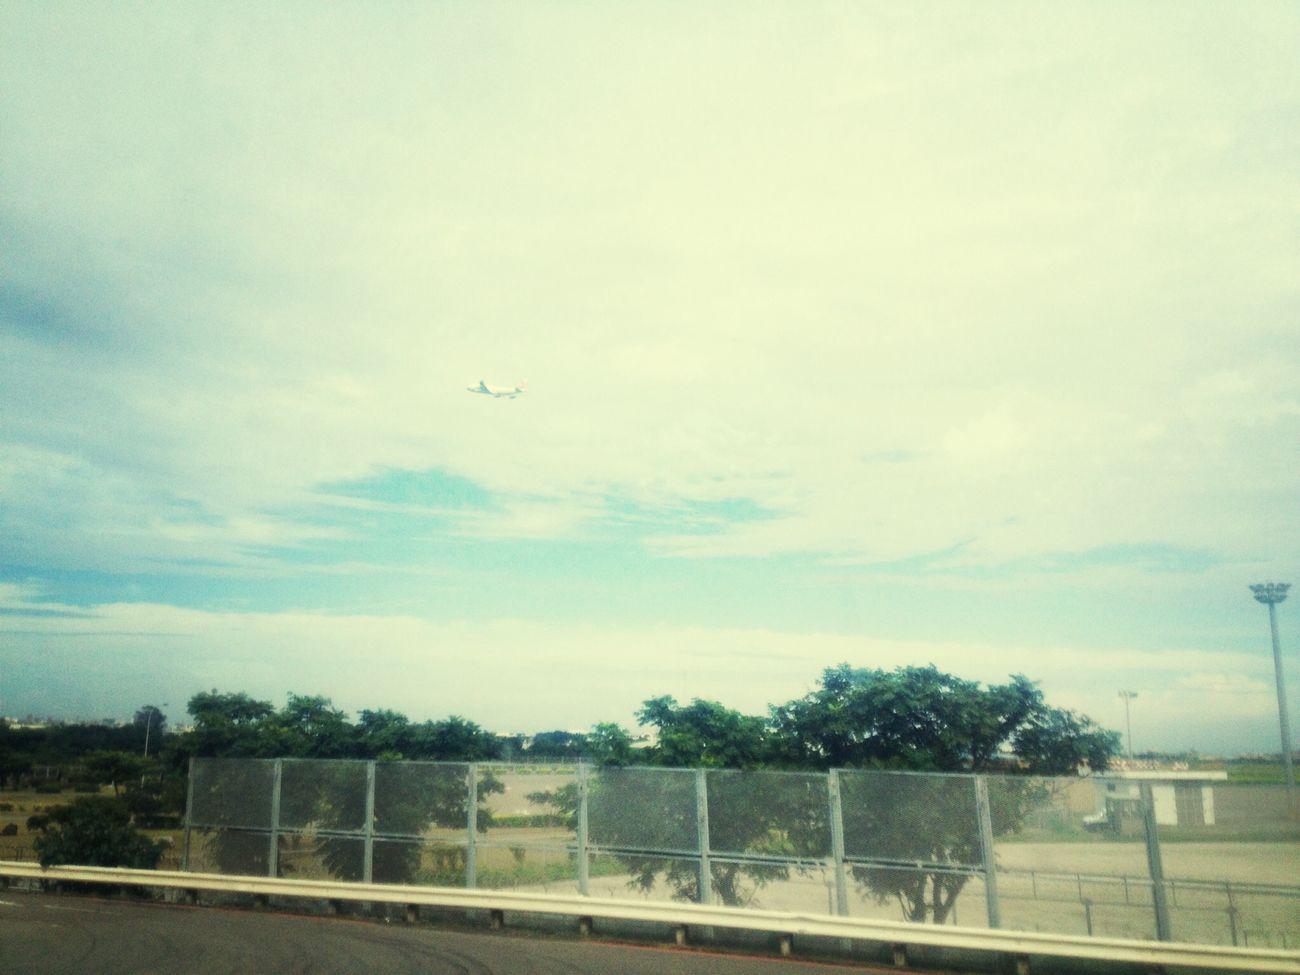 Hi, Bye! AirPlane ✈ Bye Bye Hi! Auf Wiedersehen